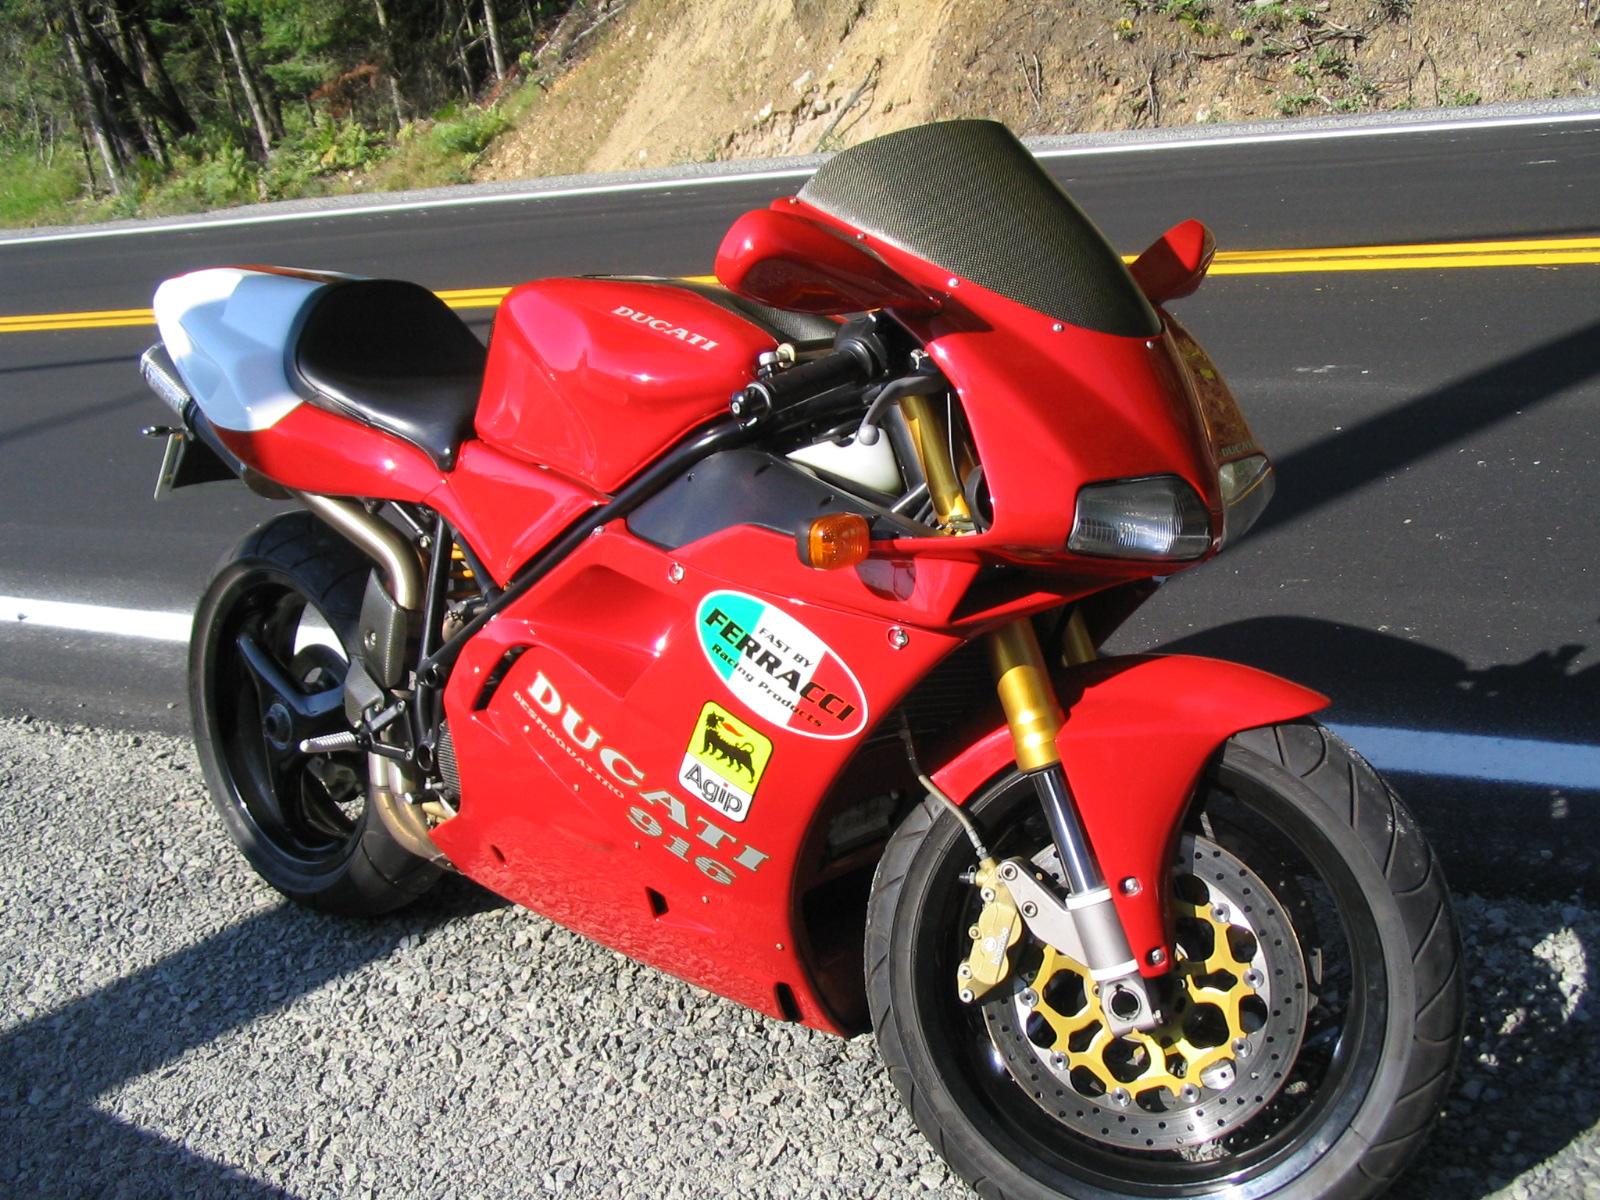 Ducati 916 First Ride